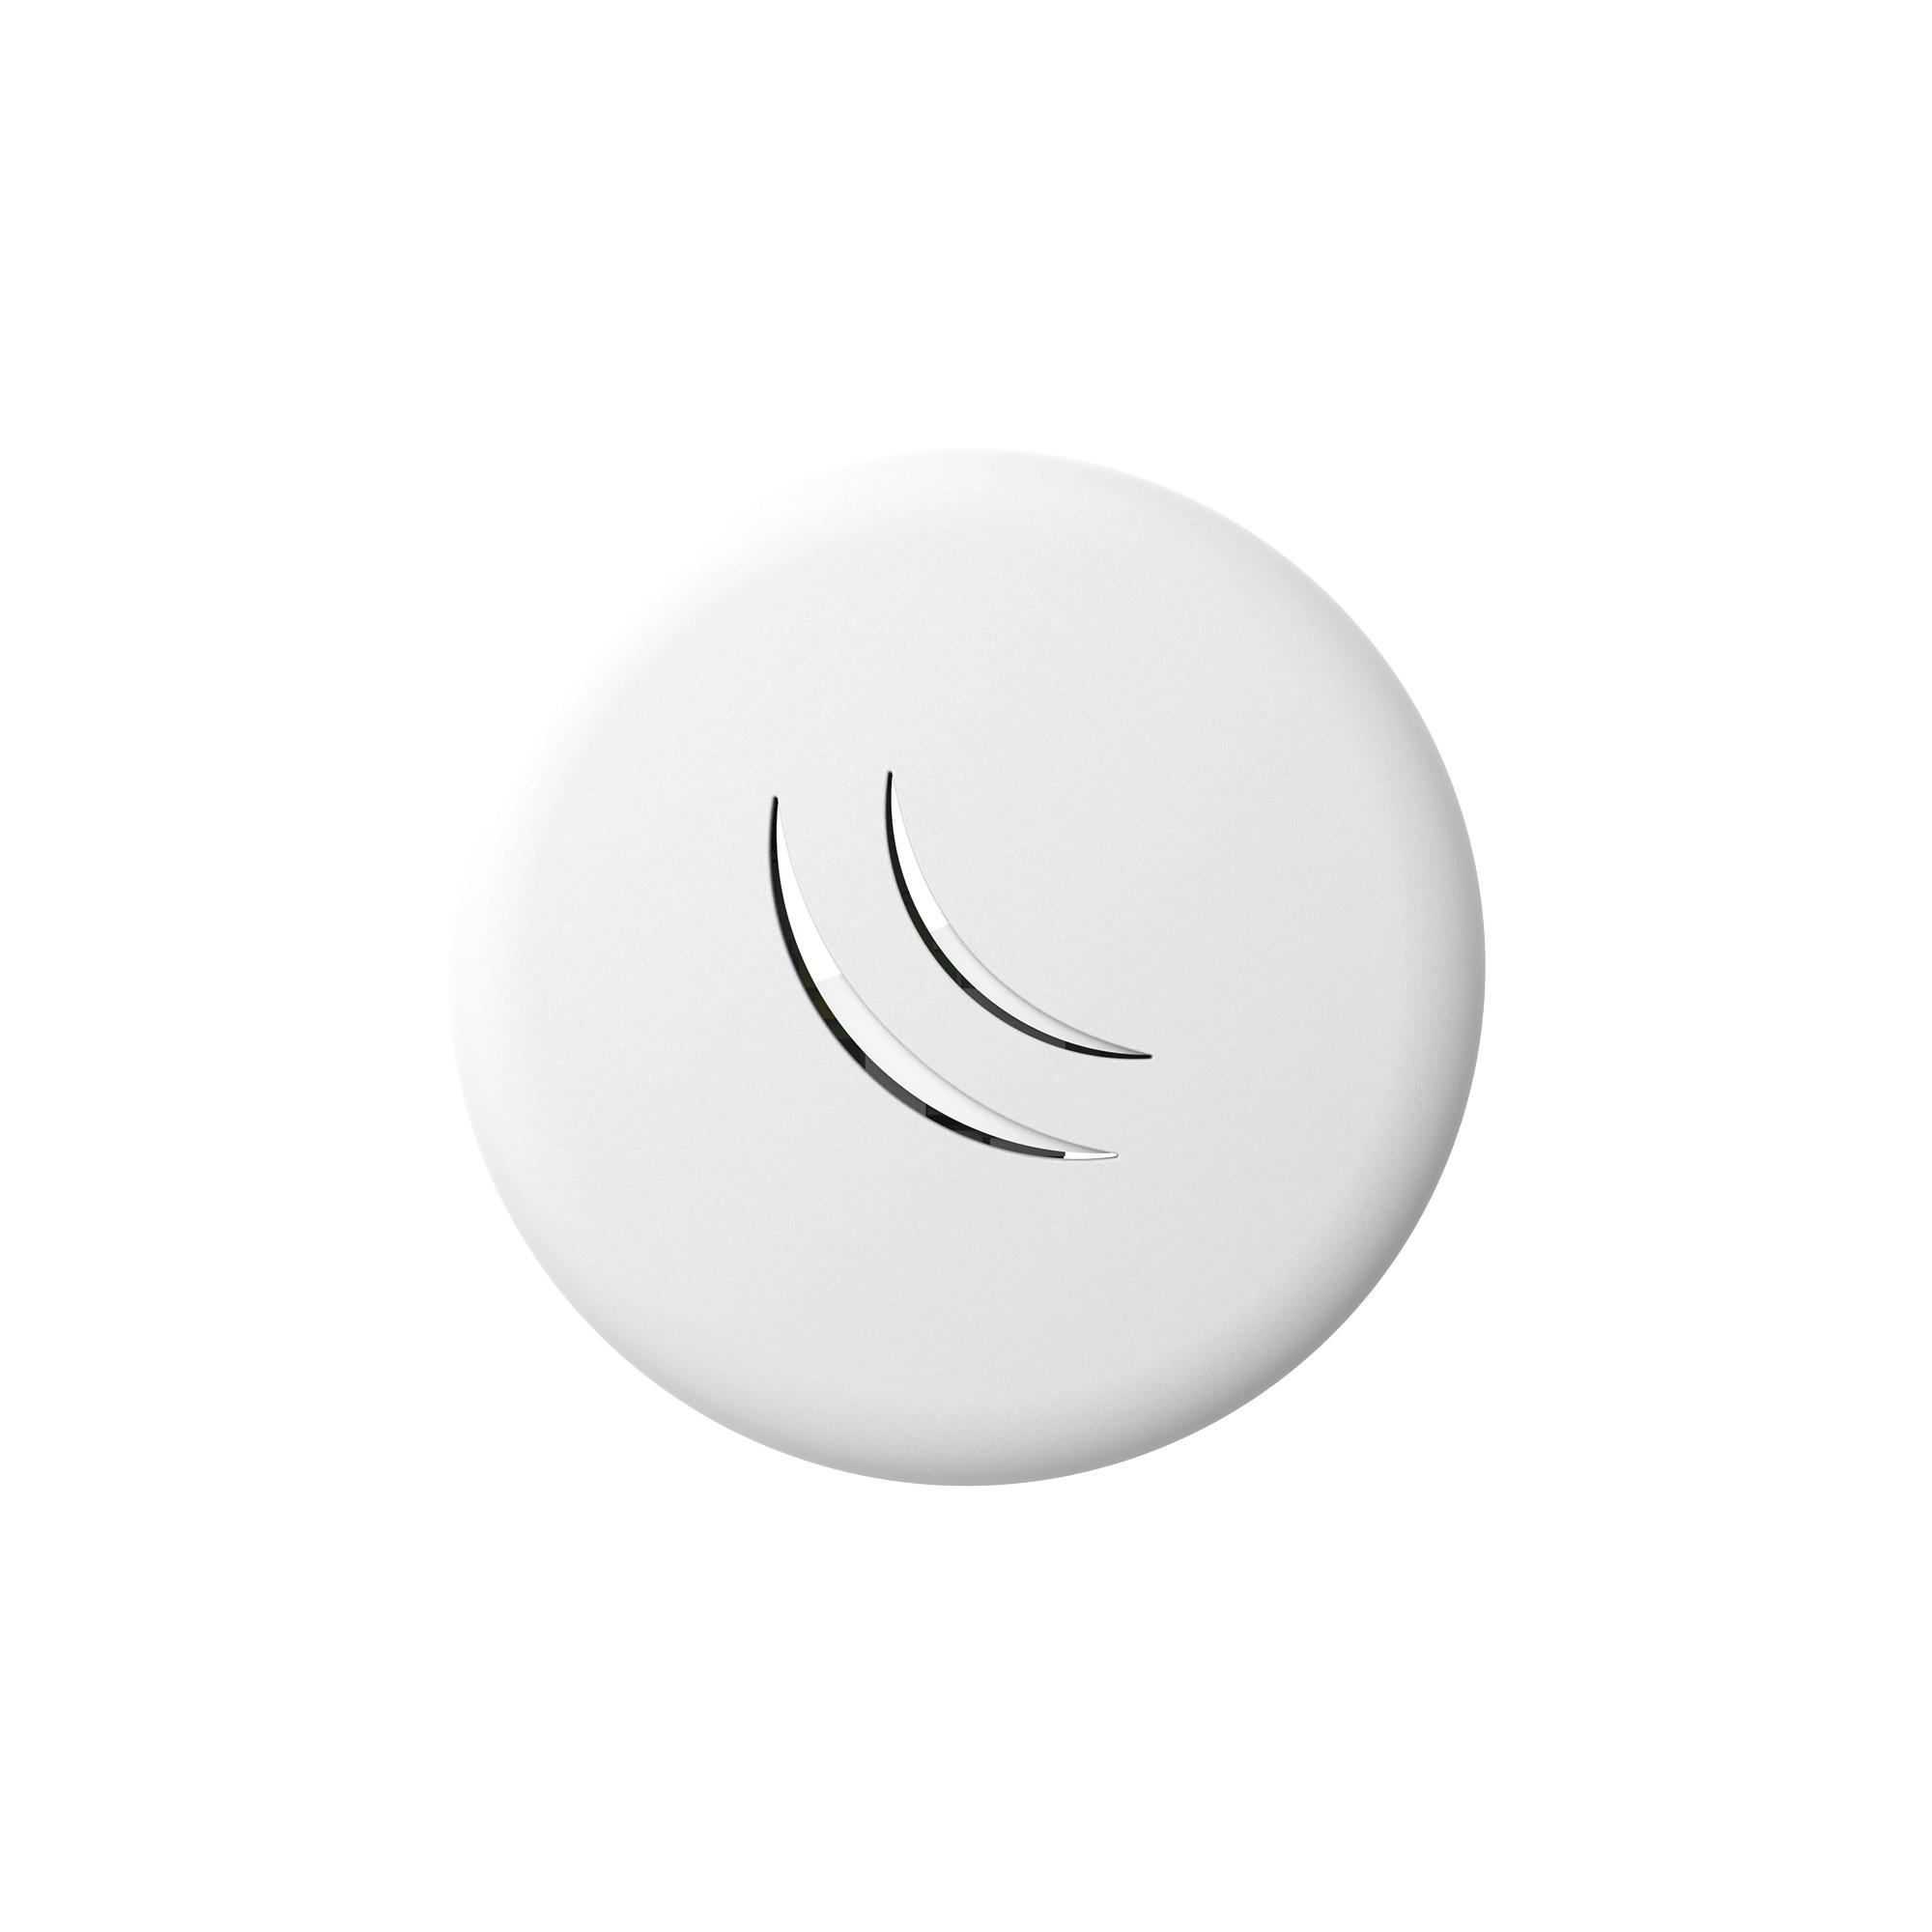 (cAP lite) Punto de acceso para interior de 2.4GHz con antena integrada de 1.5 dBi, hasta 158mW de Potencia